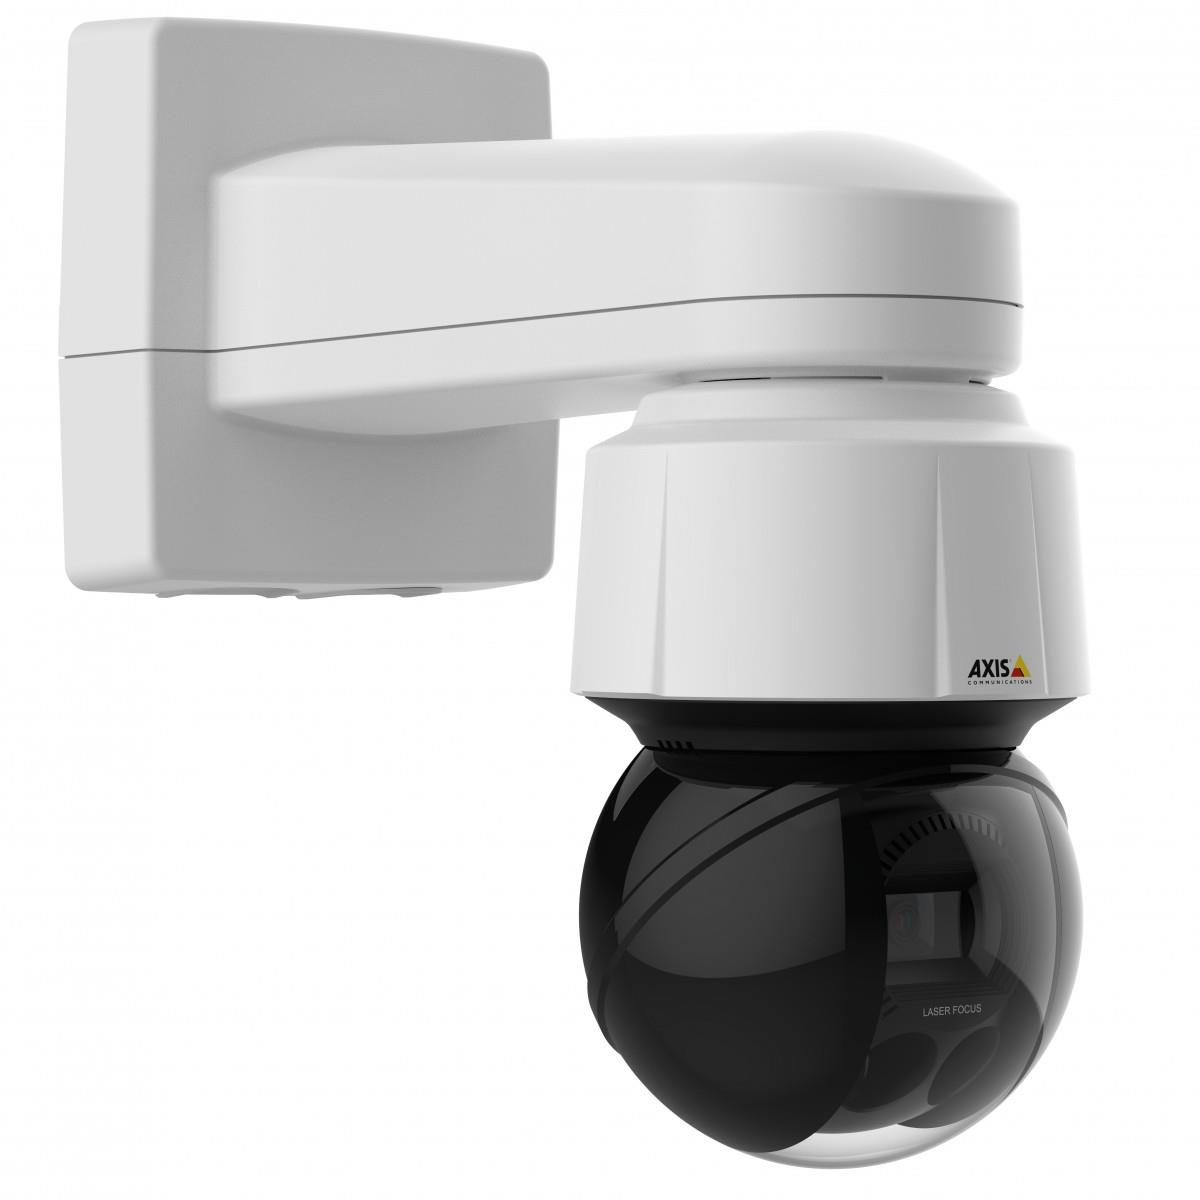 AXIS Q6155-E PTZ Network Camera 50hz Outdoor (2.1MP)